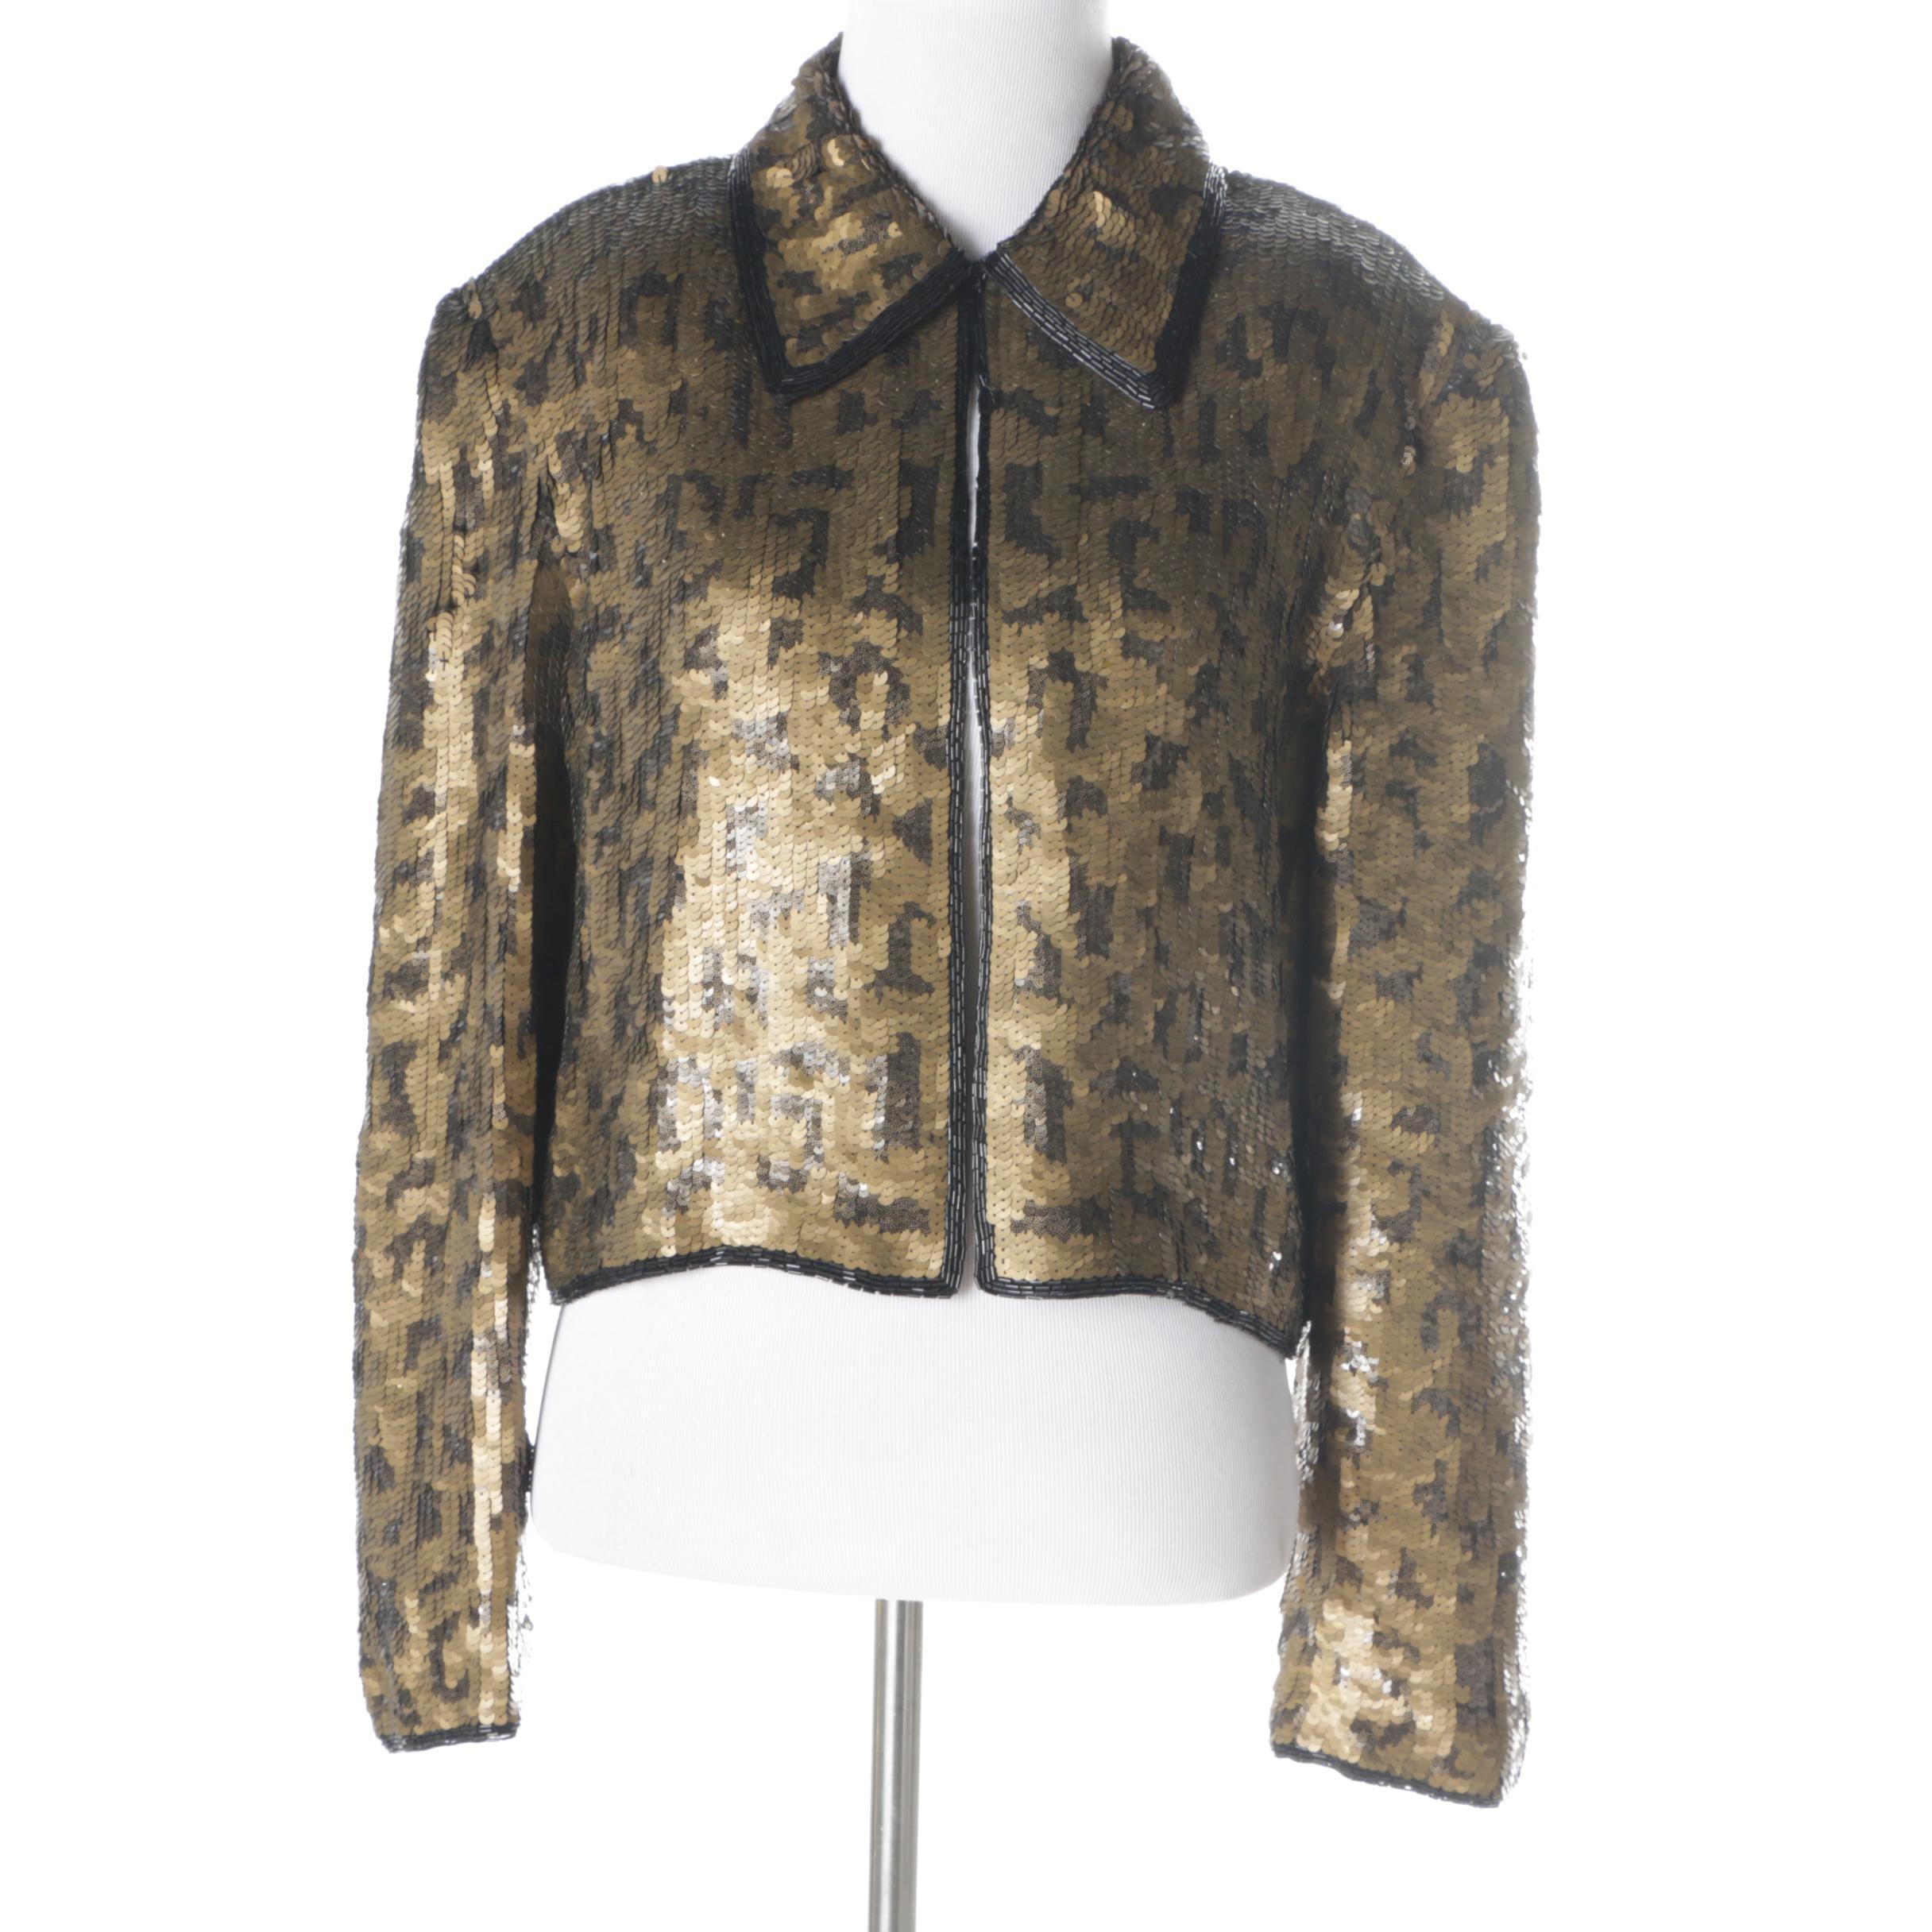 Vintage Adrianna Papell Evening Sequinned Jacket